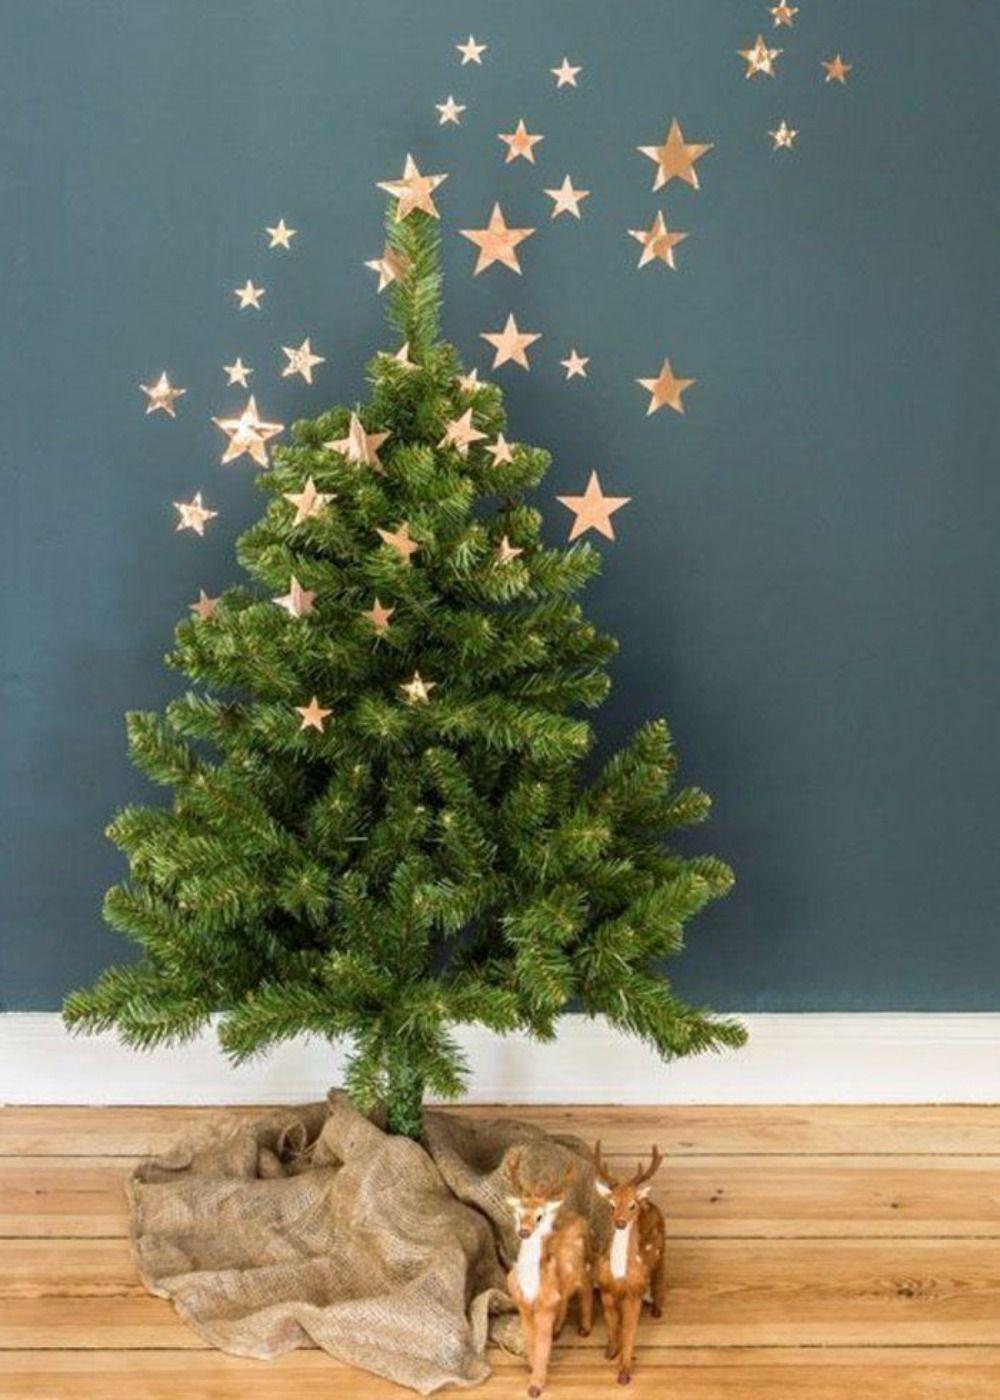 Alternative Christmas Trees More Tree Wall Decor Ideas - Diy copper stars for christmas decor